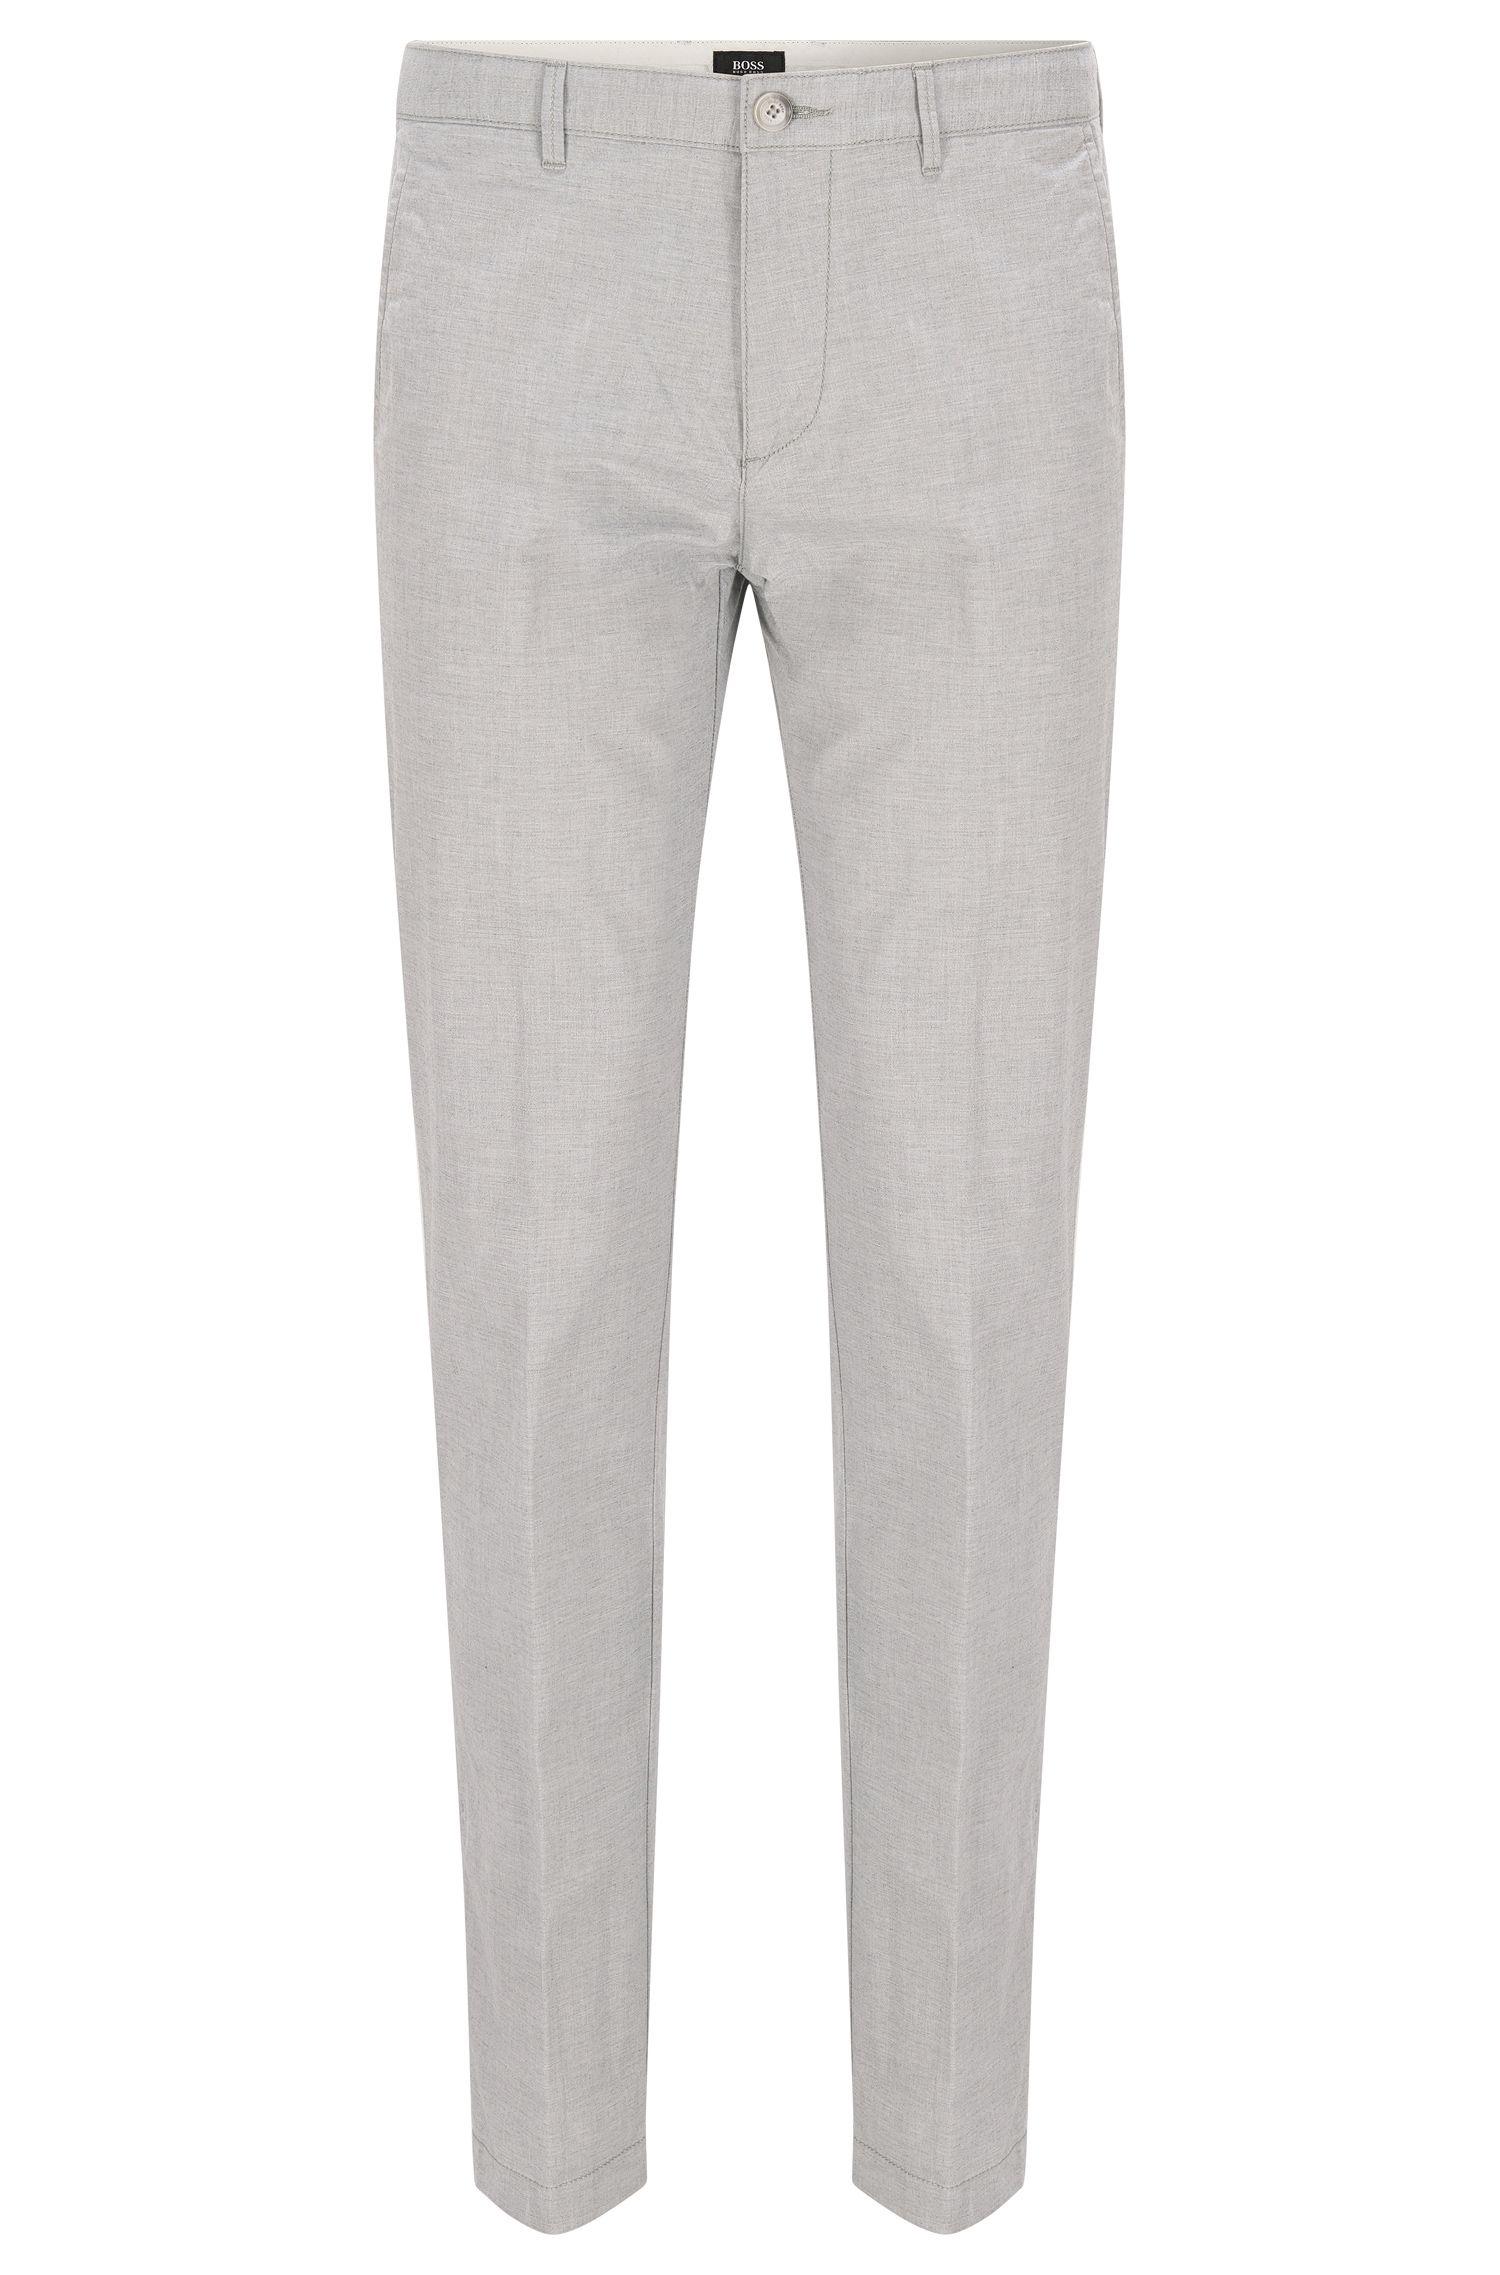 Yarn Dyed Stretch Cotton Pants, Regular Fit   Crigan